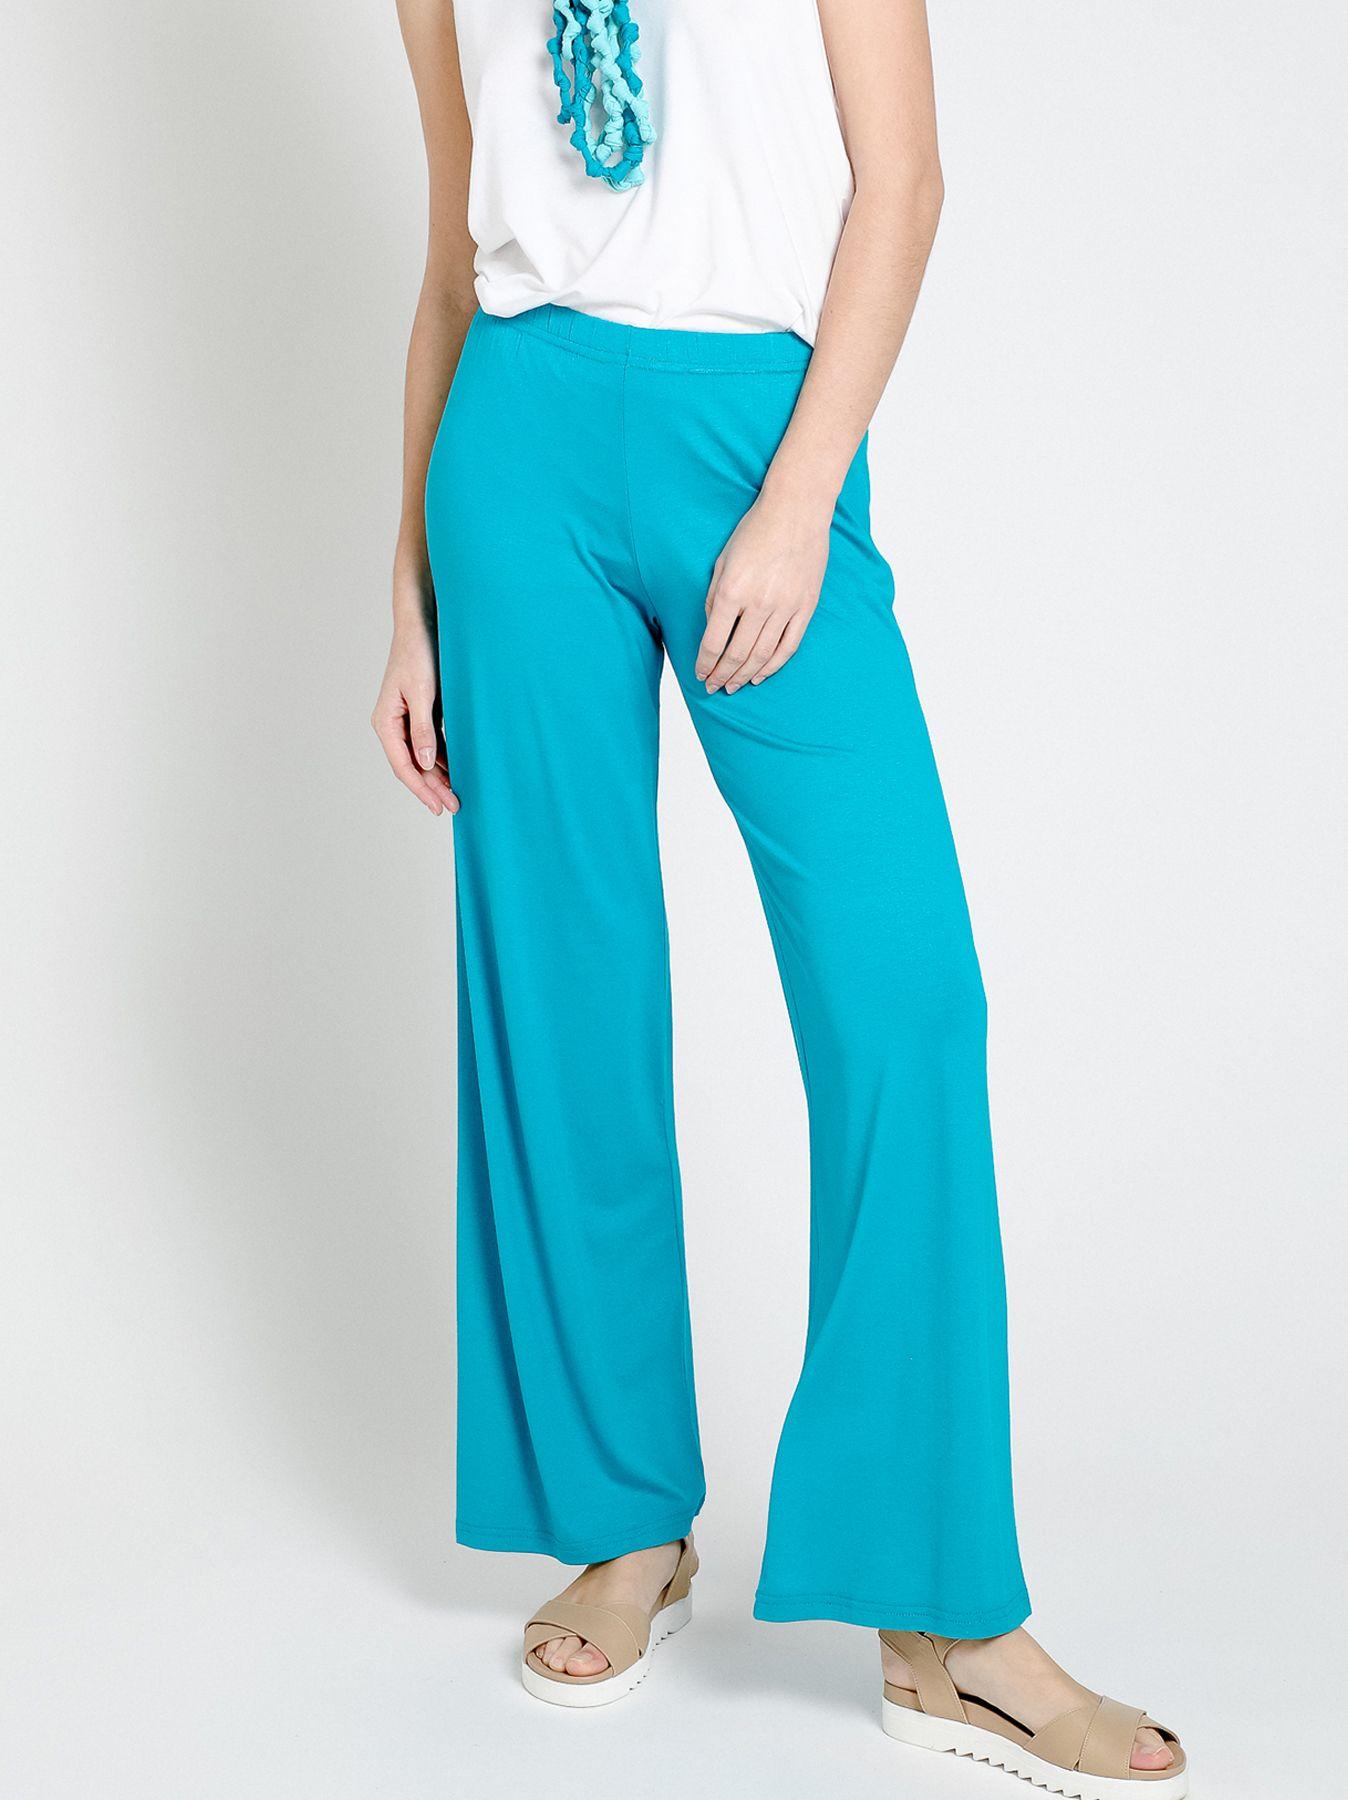 Pantalone elastico